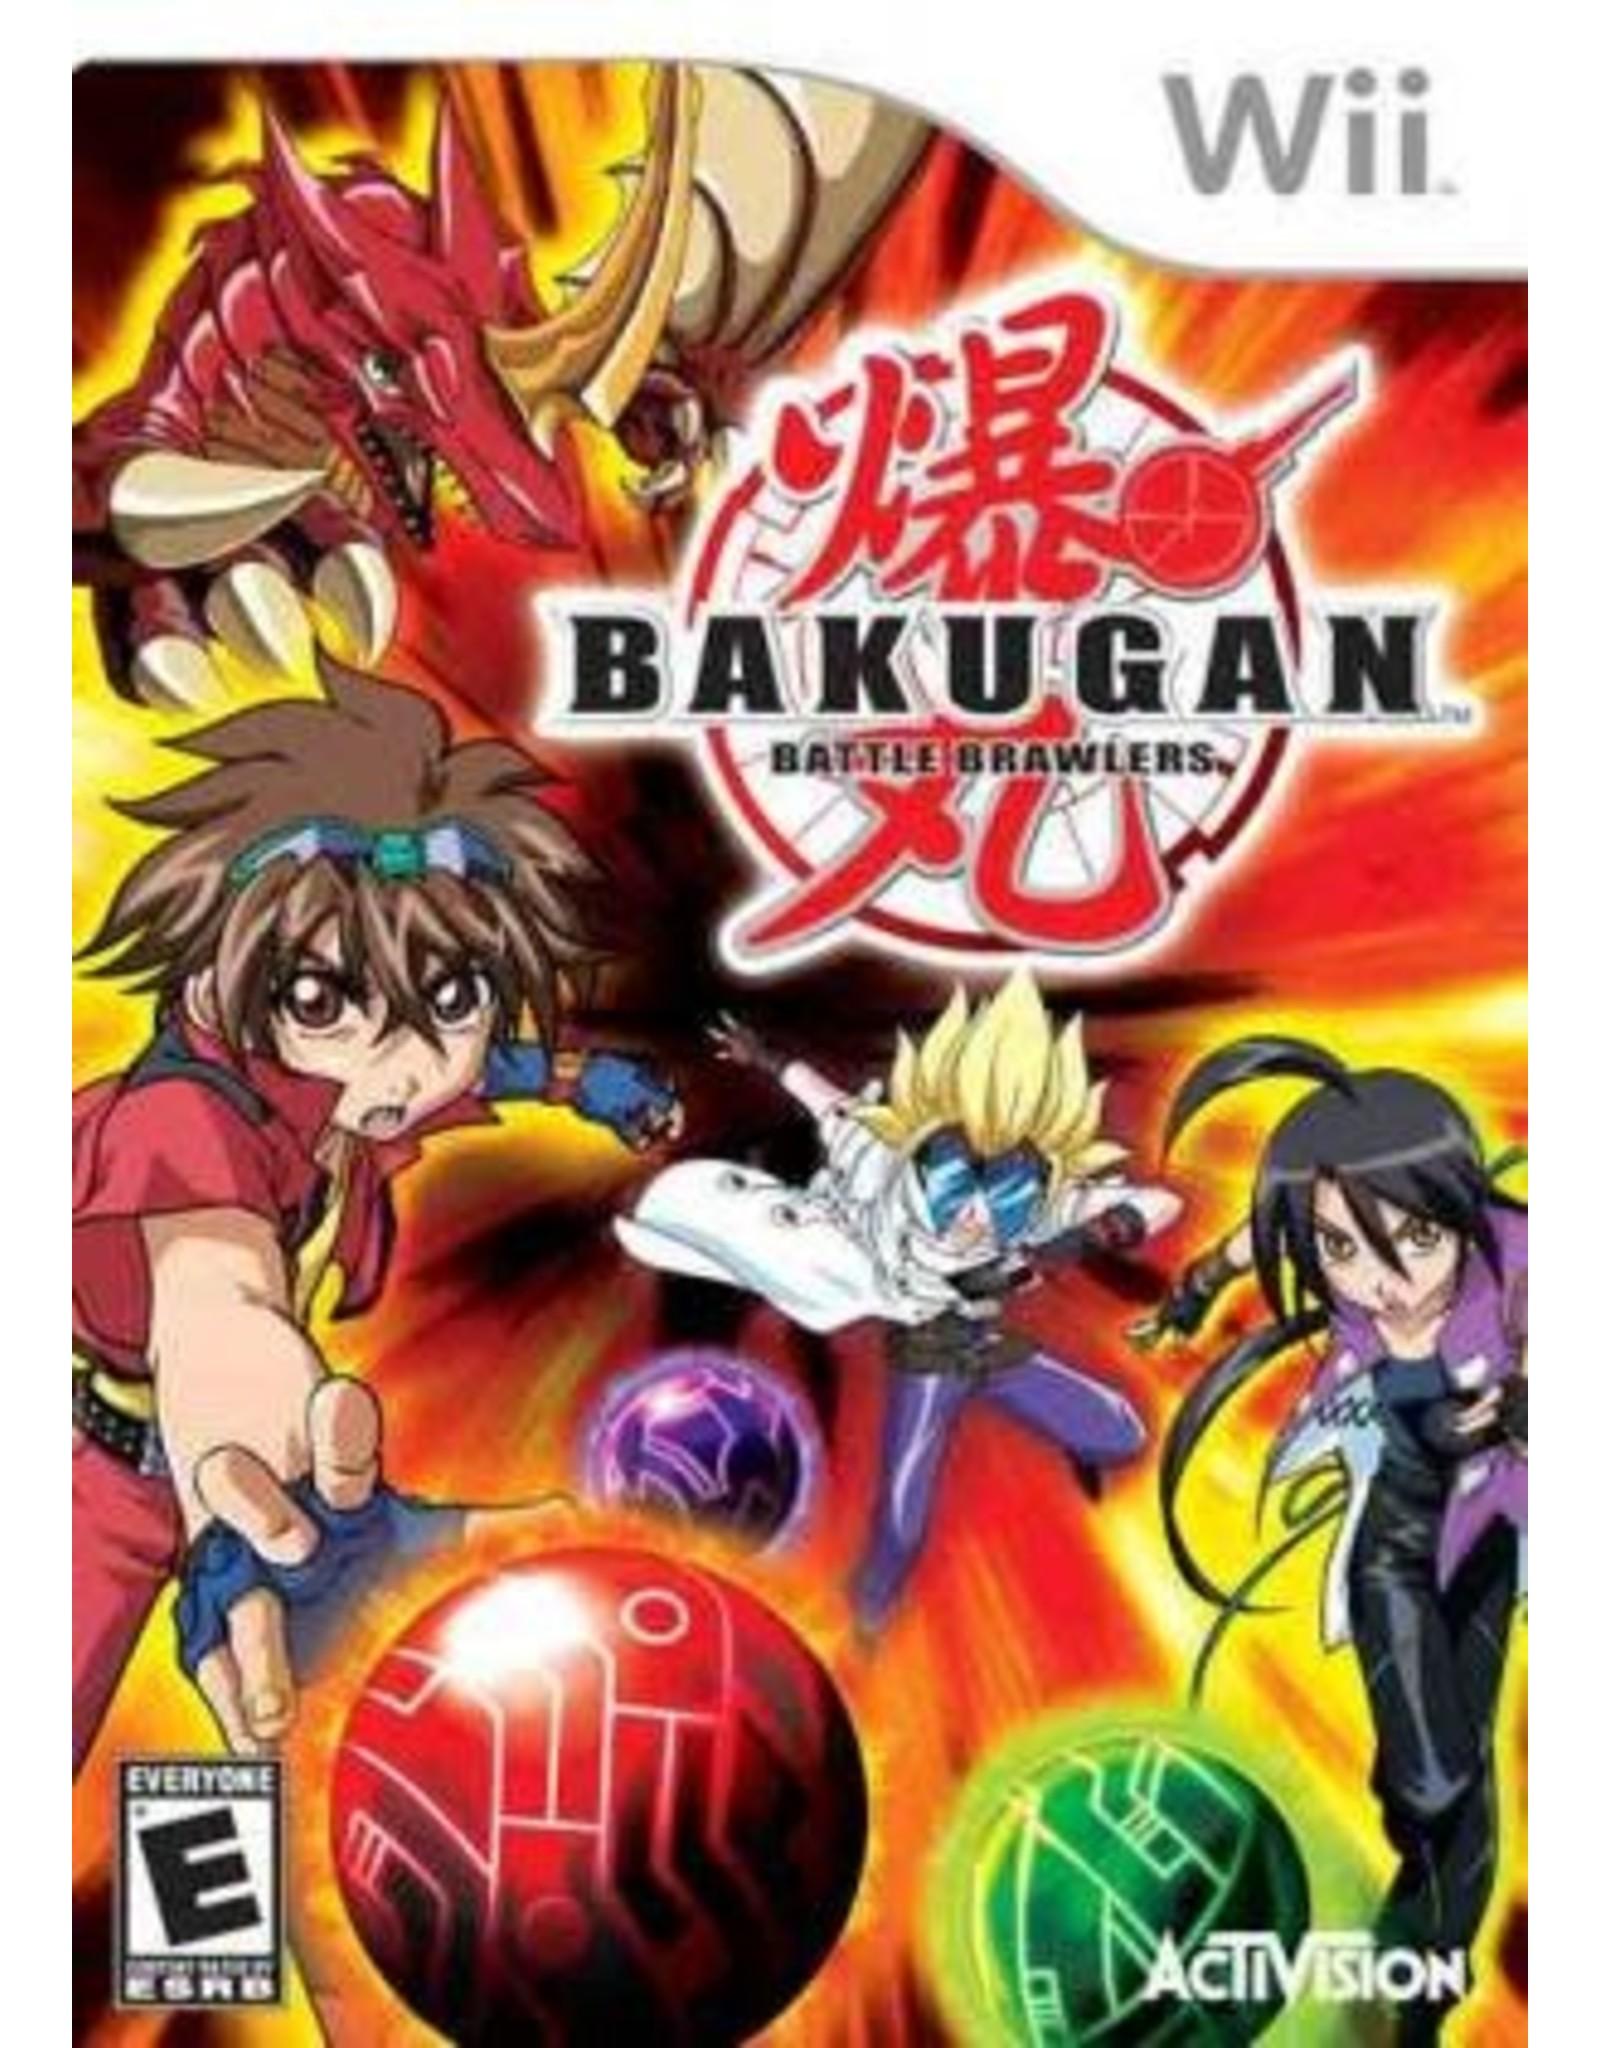 Wii Bakugan Battle Brawlers (CiB)